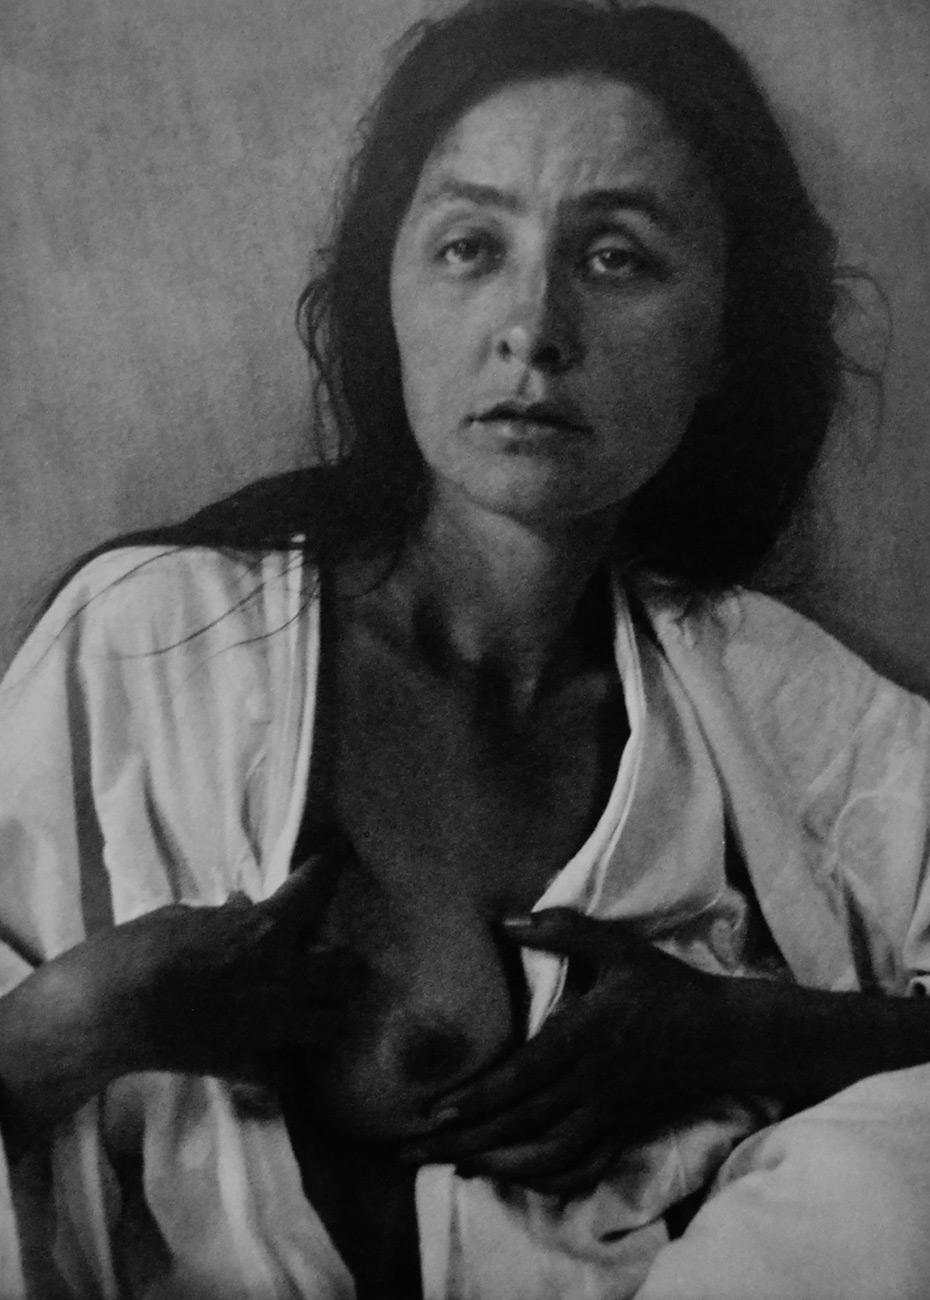 Fotoğrafçı Alfred Stieglitz ölümü